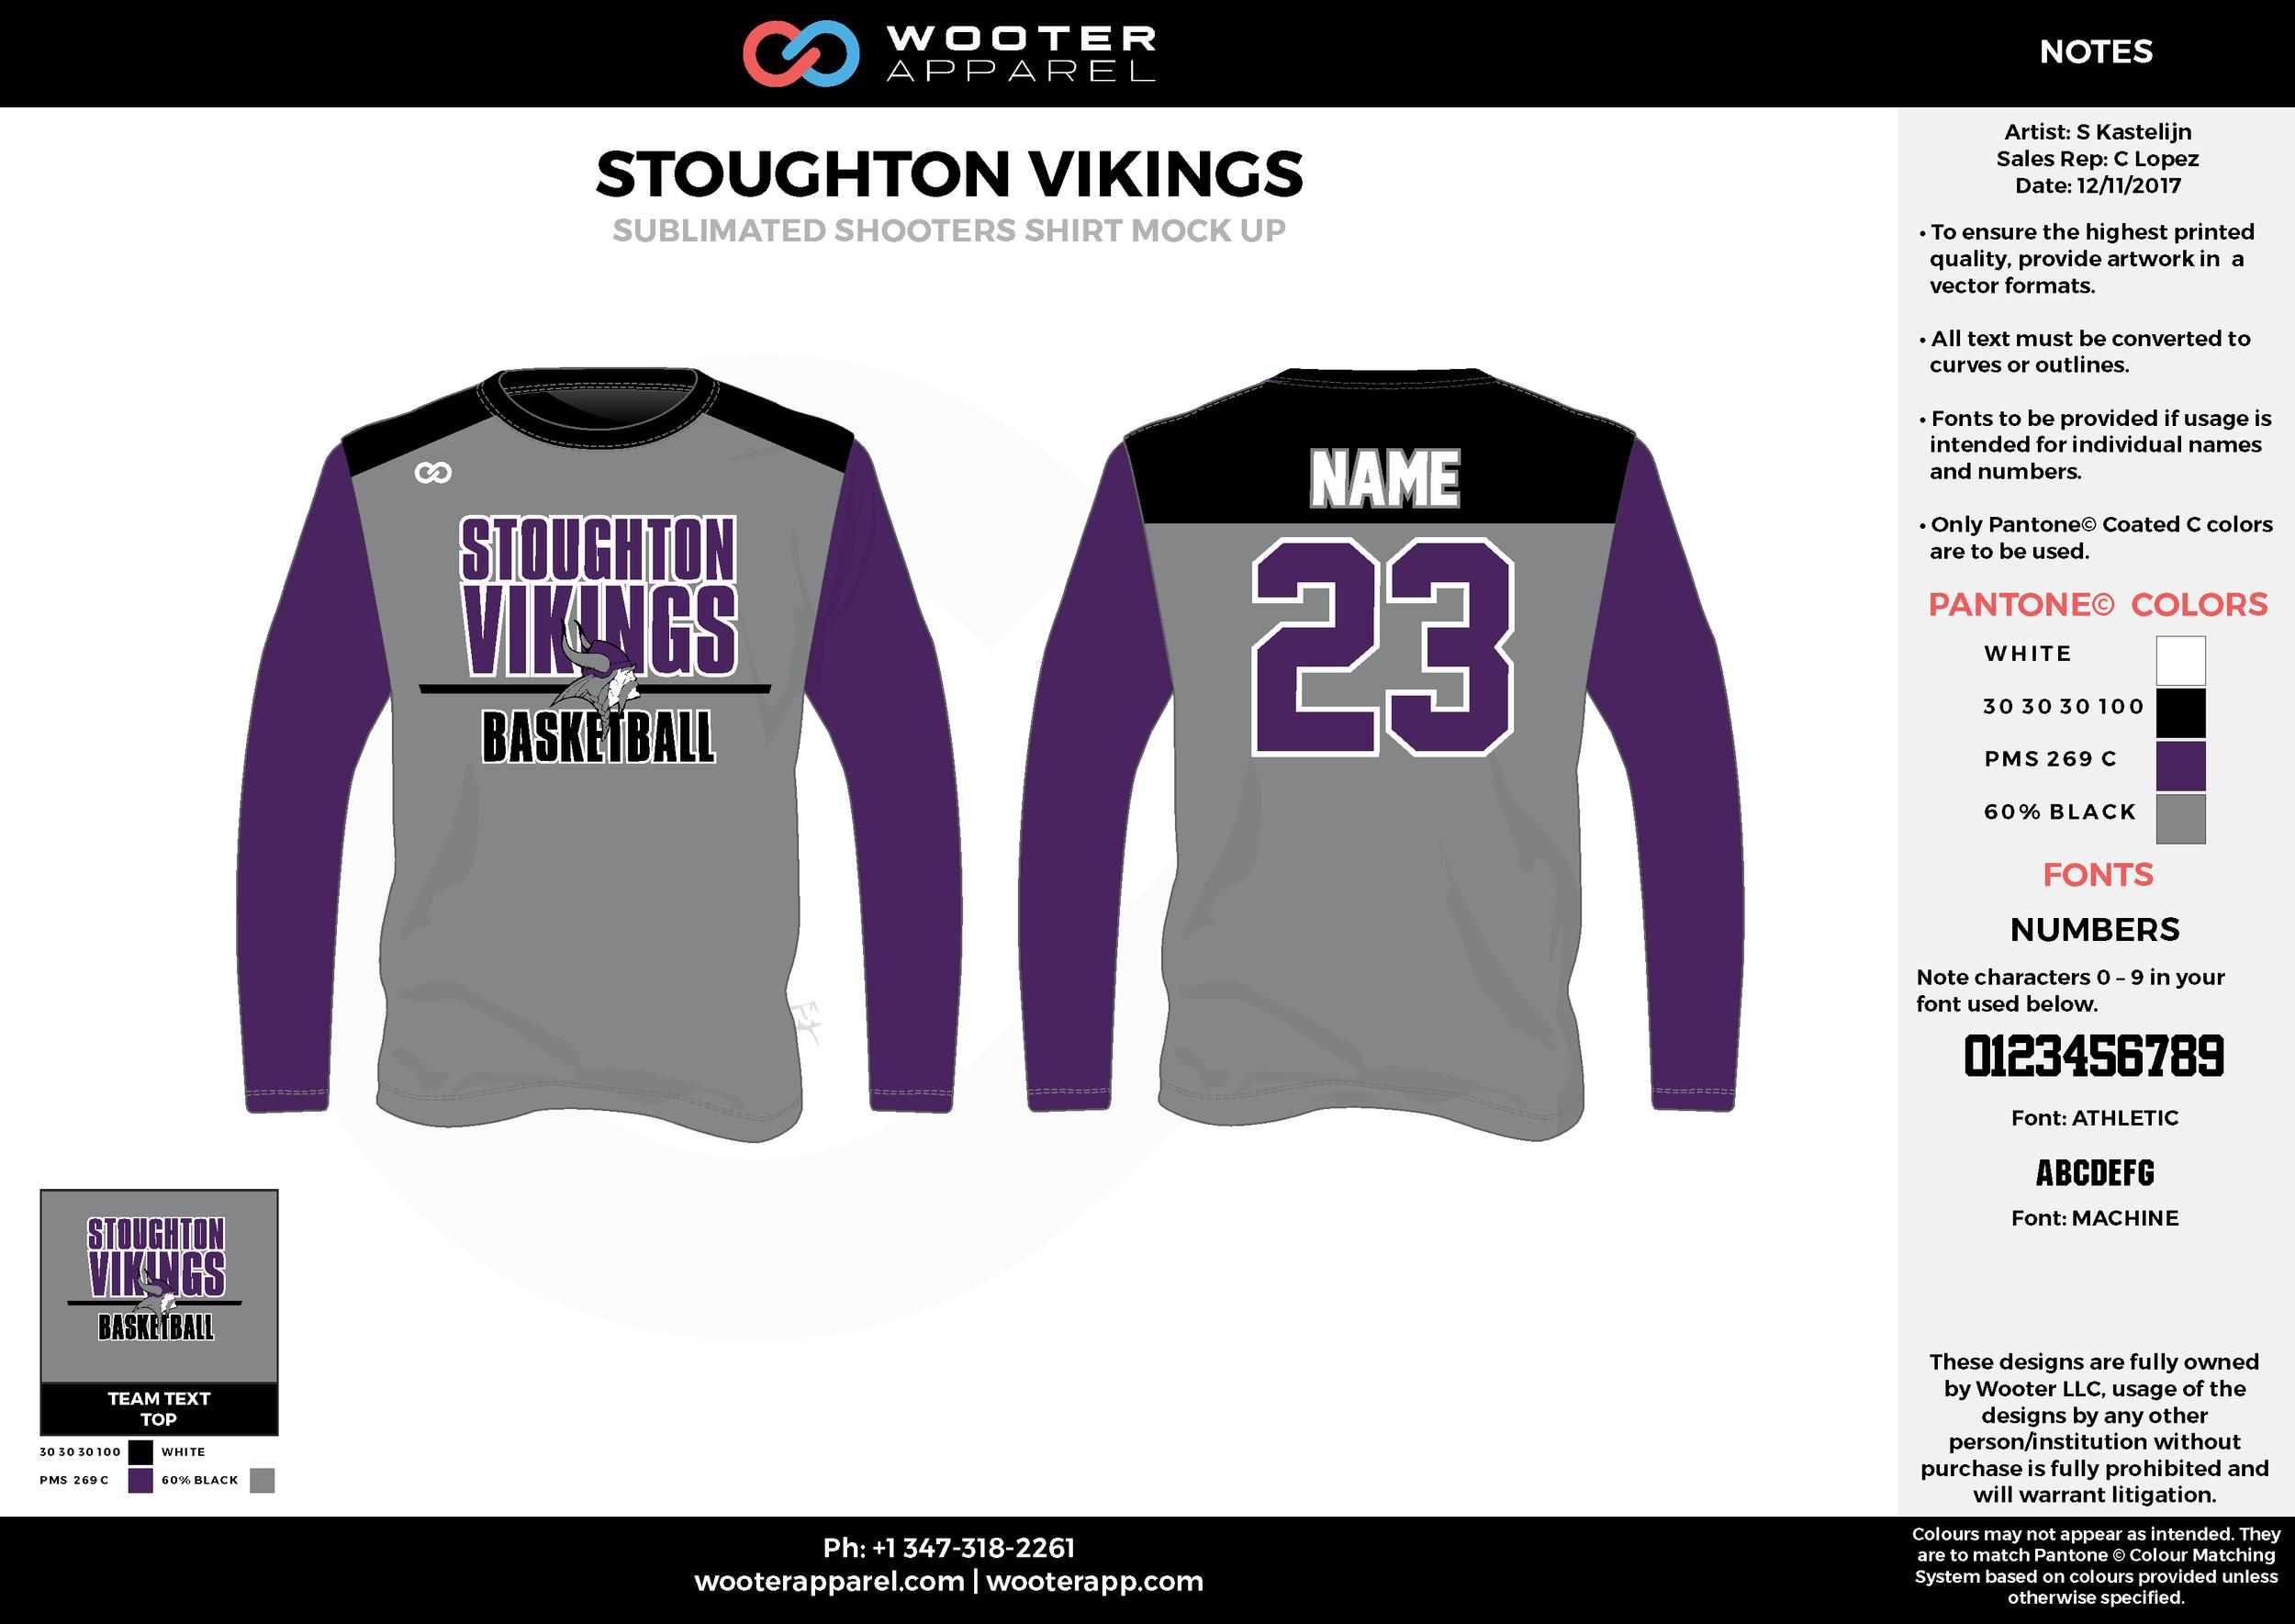 STOUGHTON VIKINGS purple black gray Basketball Long Sleeve Shooting Shirt